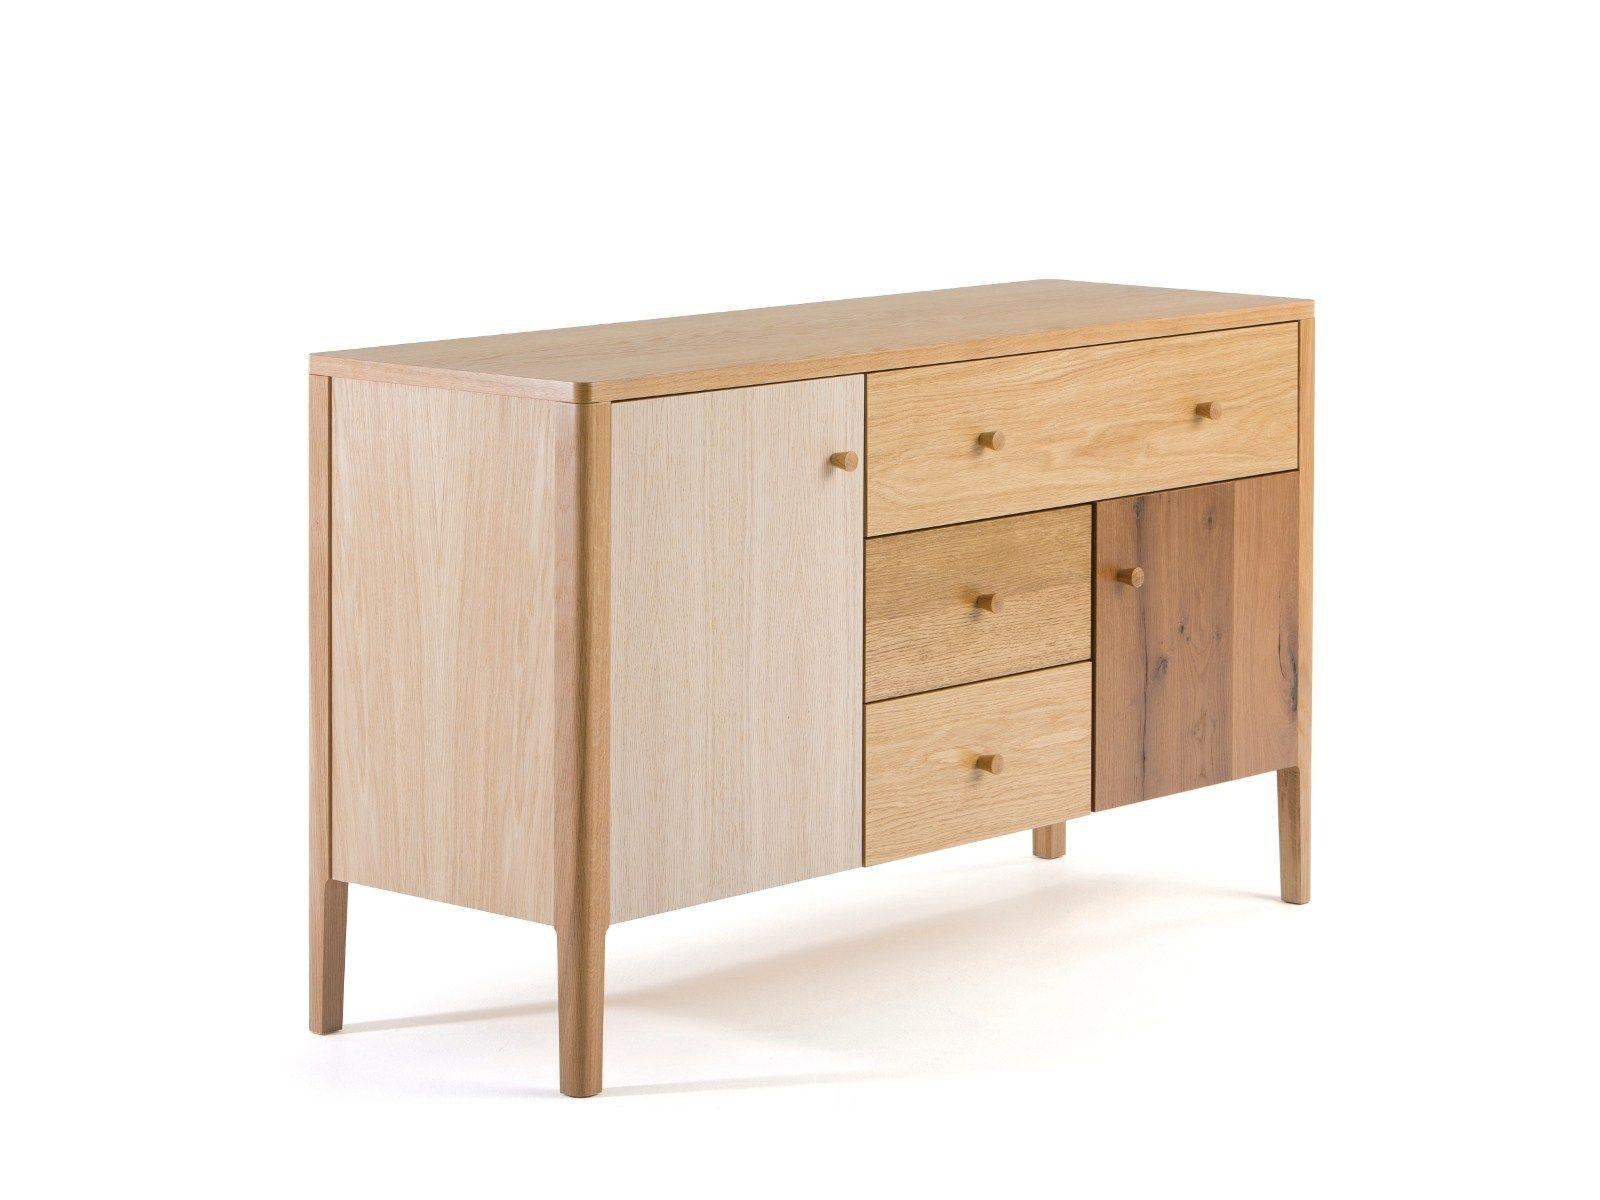 sideboard aus holz mit schubladen villa by woodman. Black Bedroom Furniture Sets. Home Design Ideas